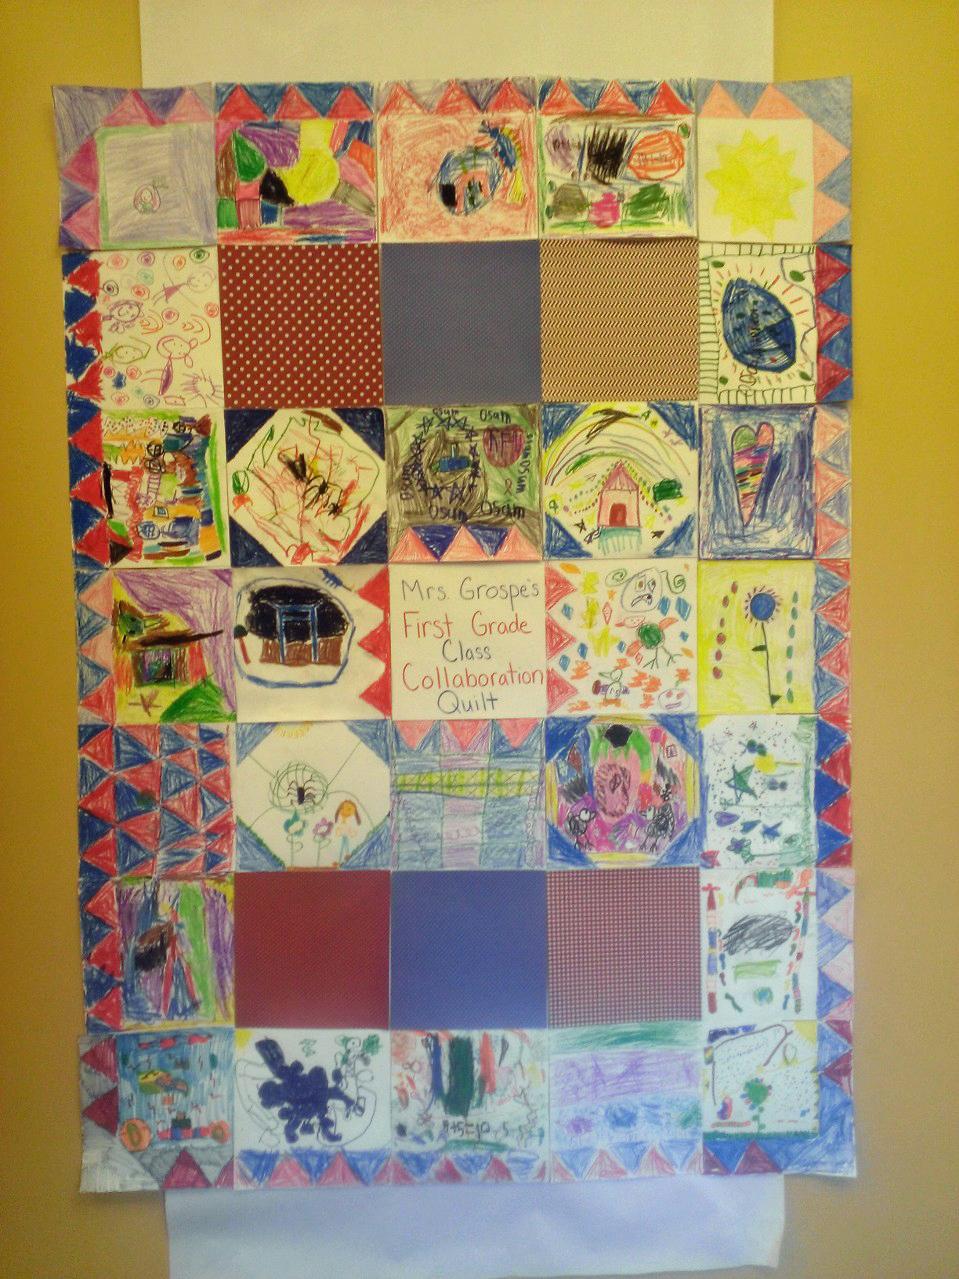 1st Grade - Collaboration Quilt